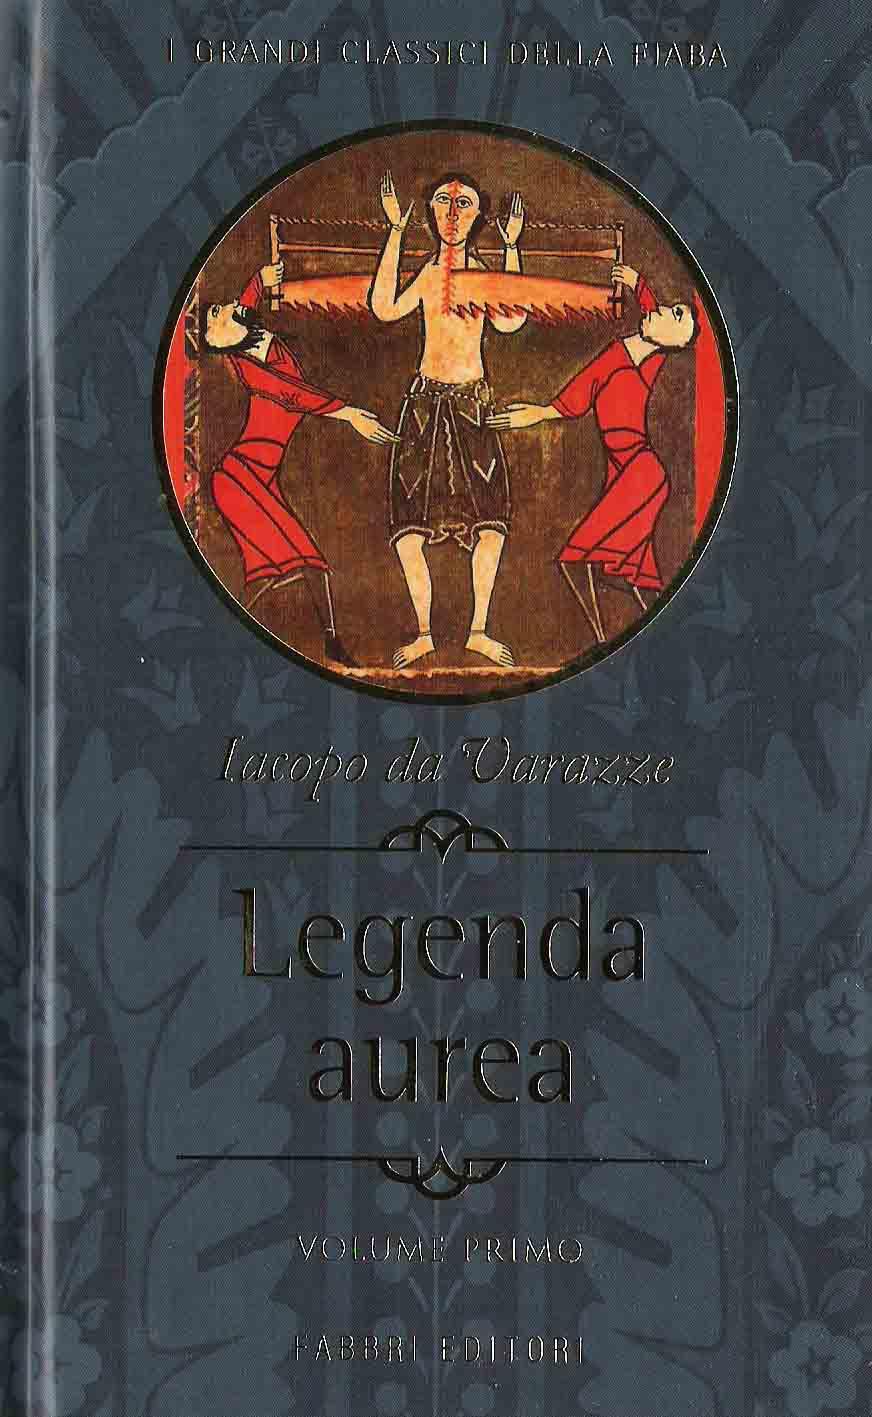 Legenda aurea, Vol. 1